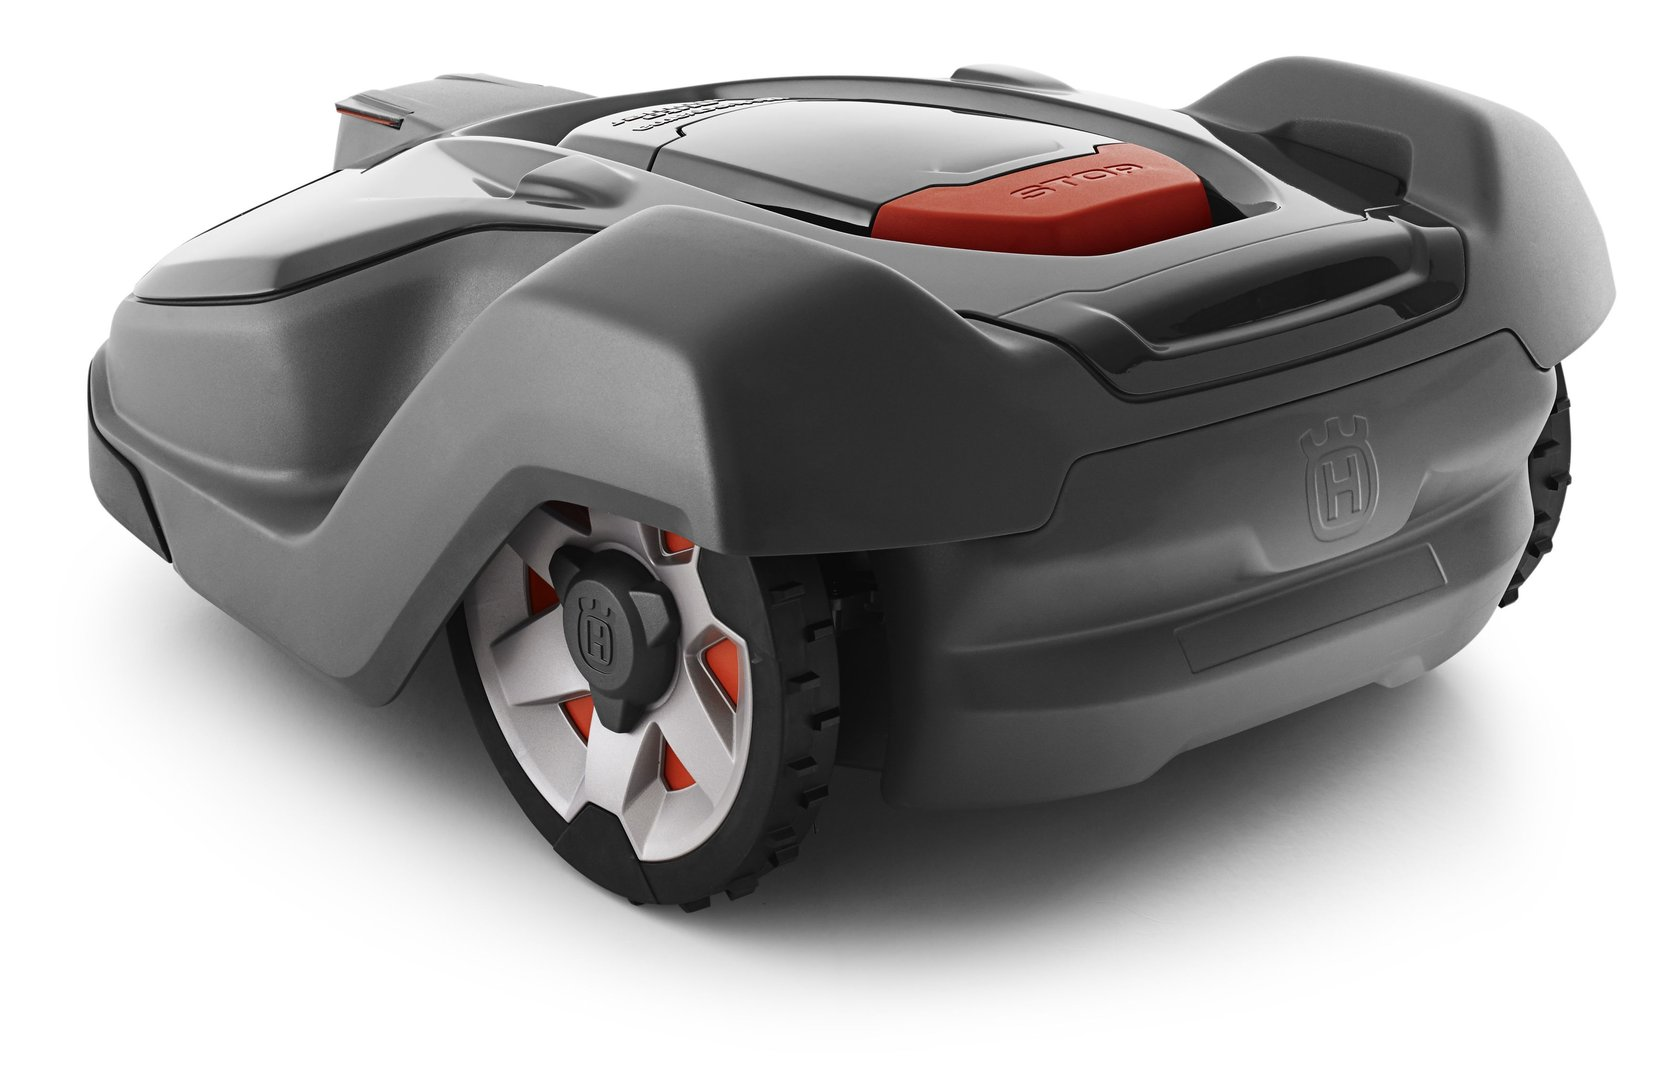 husqvarna automower 450x immergr n24. Black Bedroom Furniture Sets. Home Design Ideas